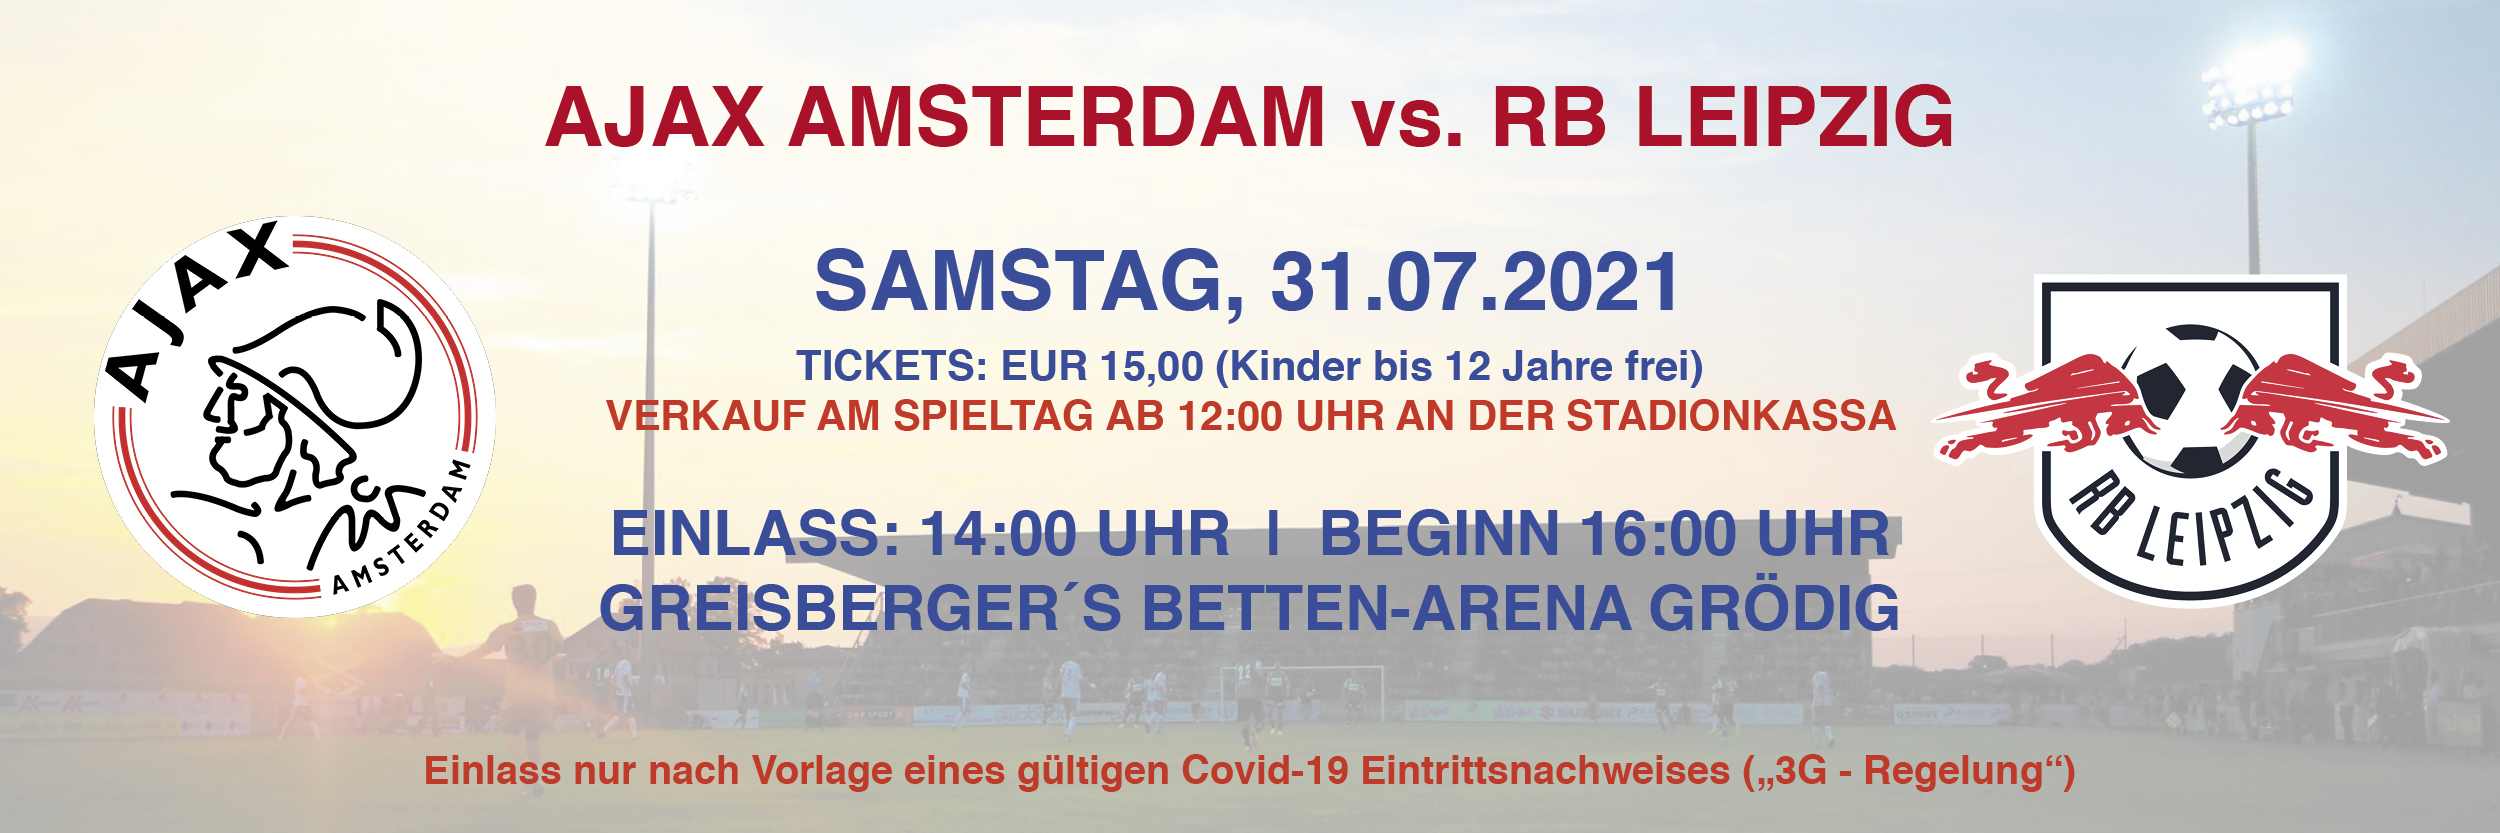 match-highlight-ajax-leipzig-310721